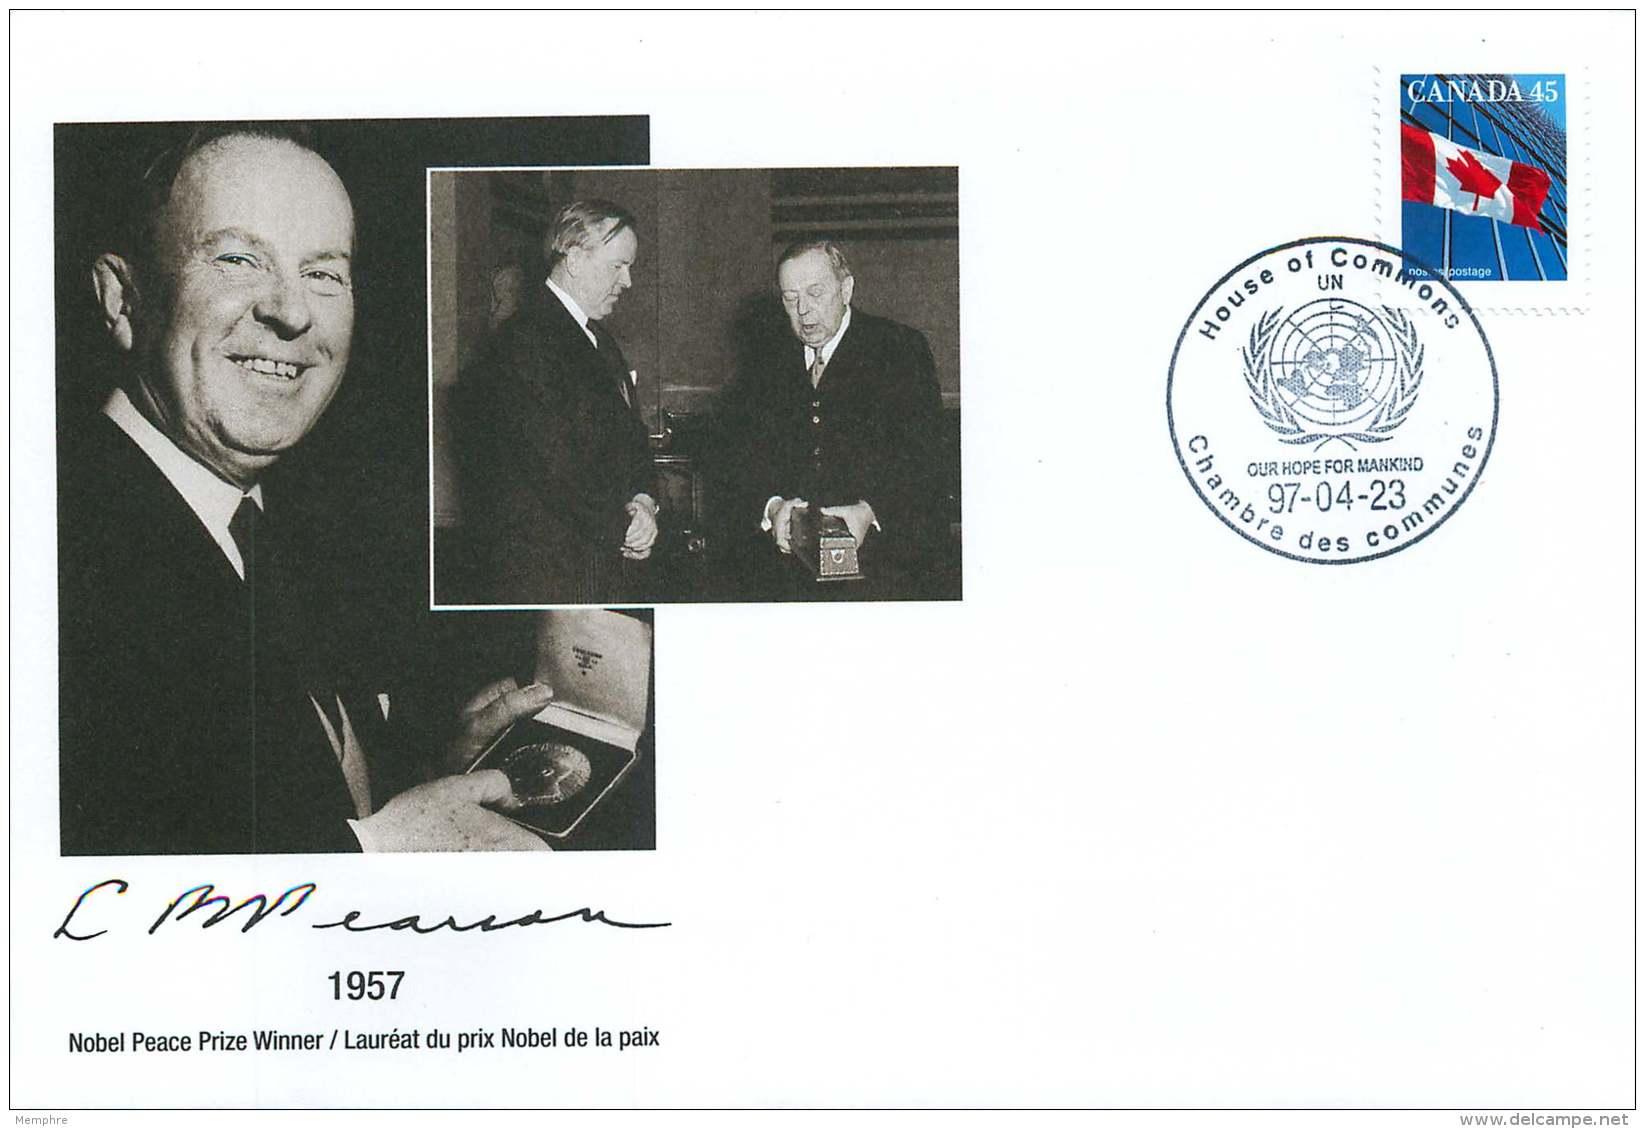 1997 Lester B Pearson  Dilplomat, Nobel Peace Prize Winner, Prime Minister Of Canada S24a-c - Enveloppes Commémoratives